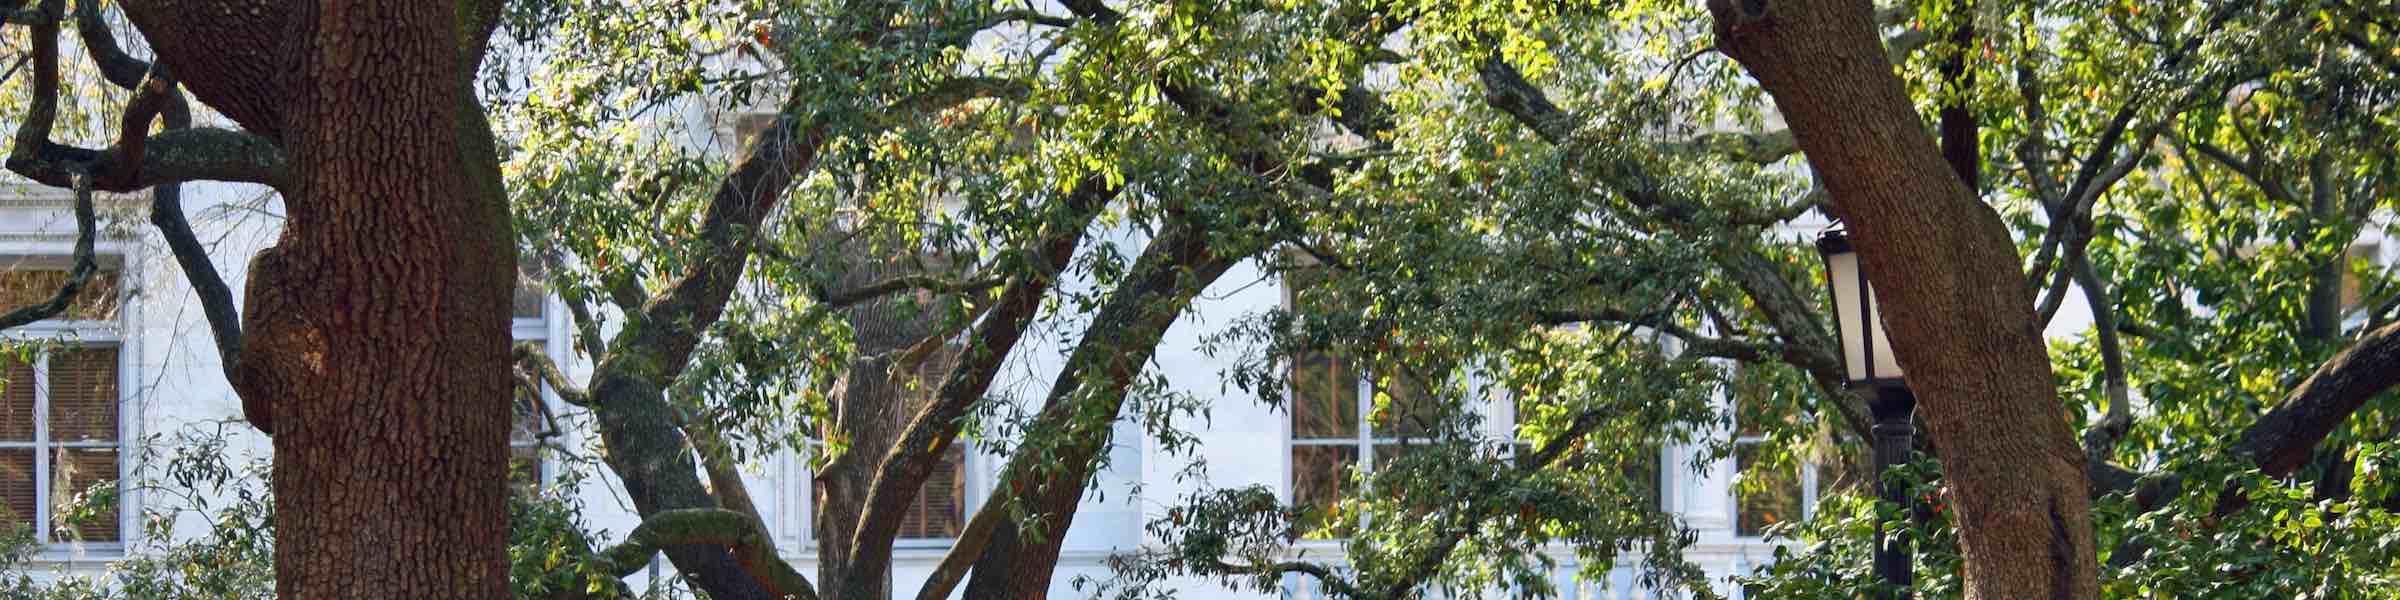 Leafy trees in Wright Square, Savannah, GA.